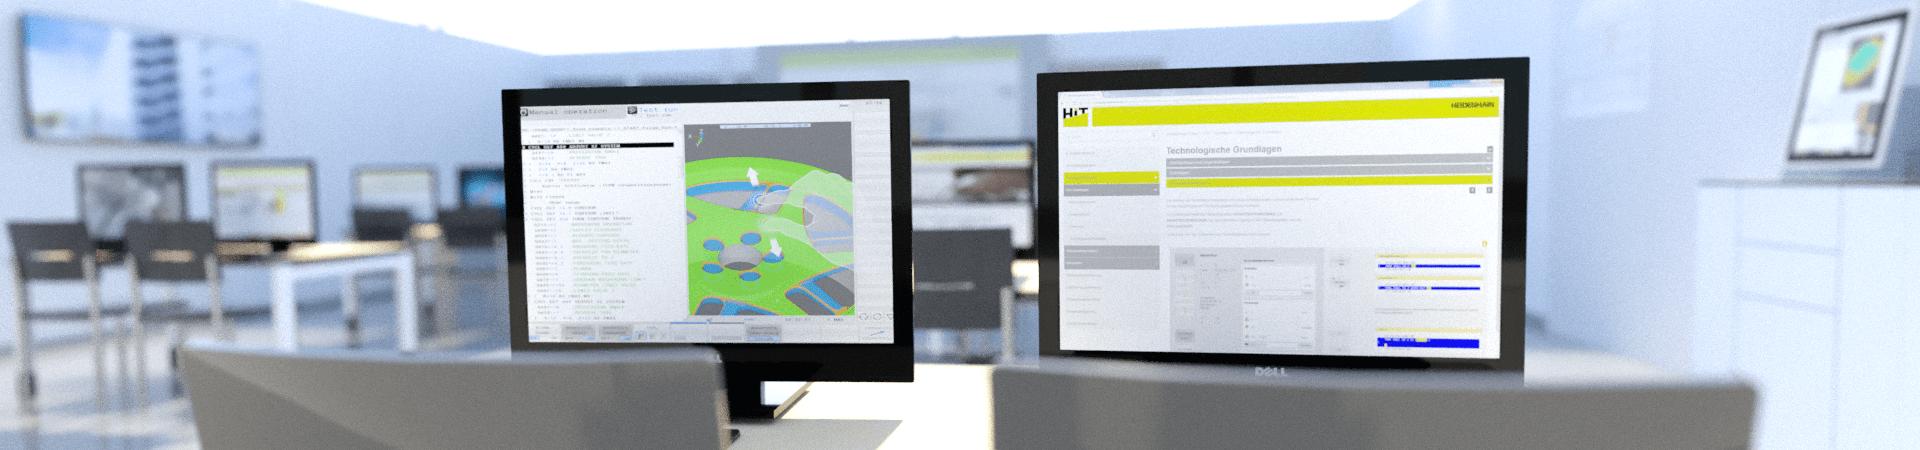 hight resolution of hit heidenhain interactive training